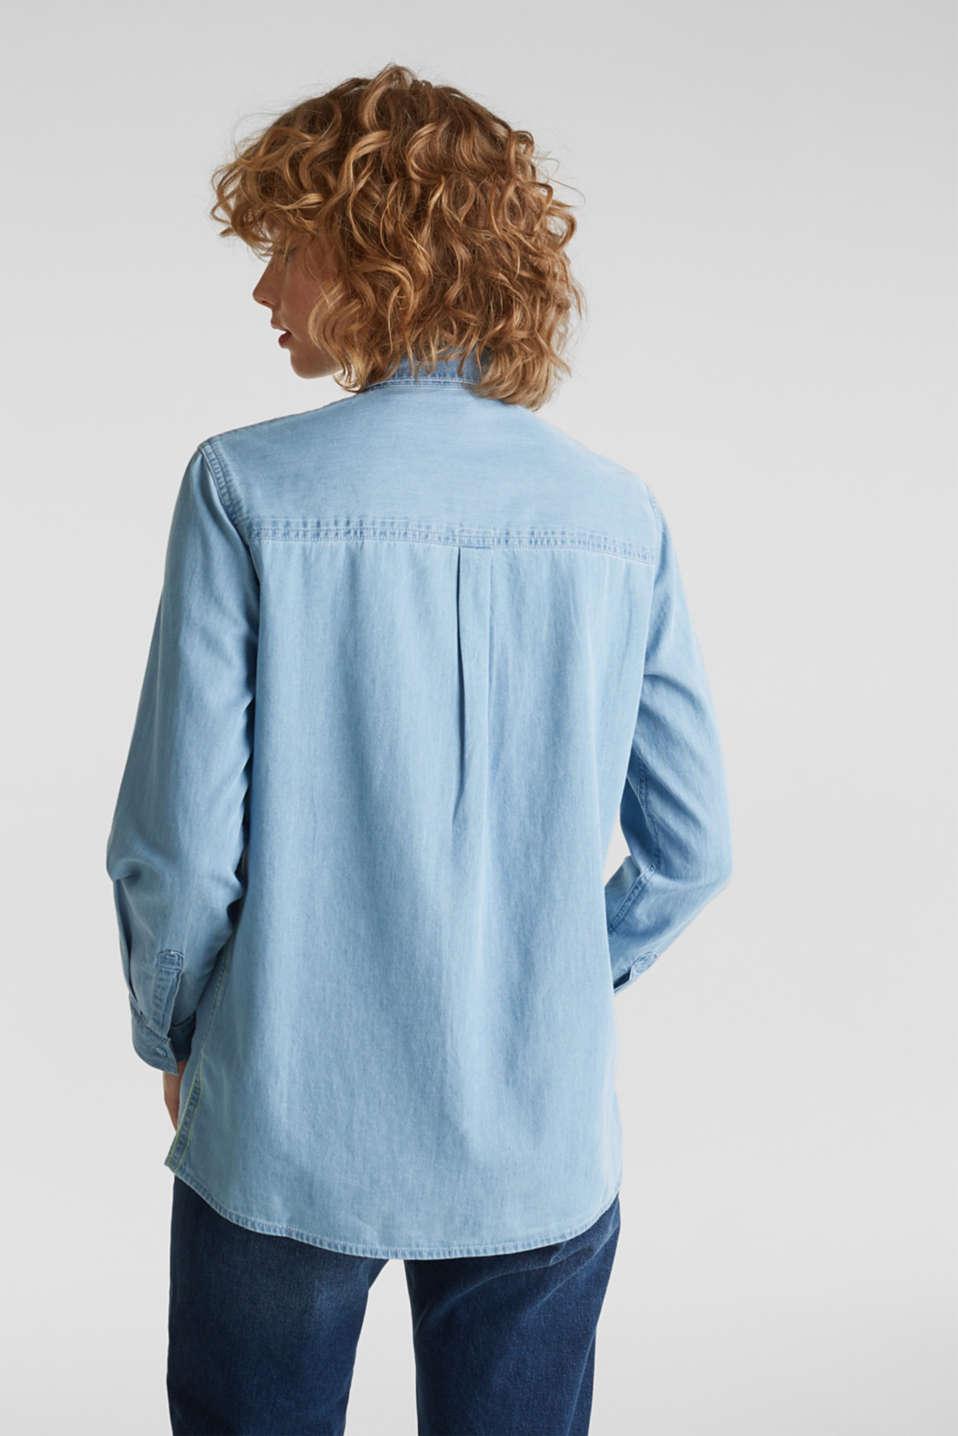 Bleached denim shirt with pockets, 100% cotton, BLUE LIGHT WASH, detail image number 3